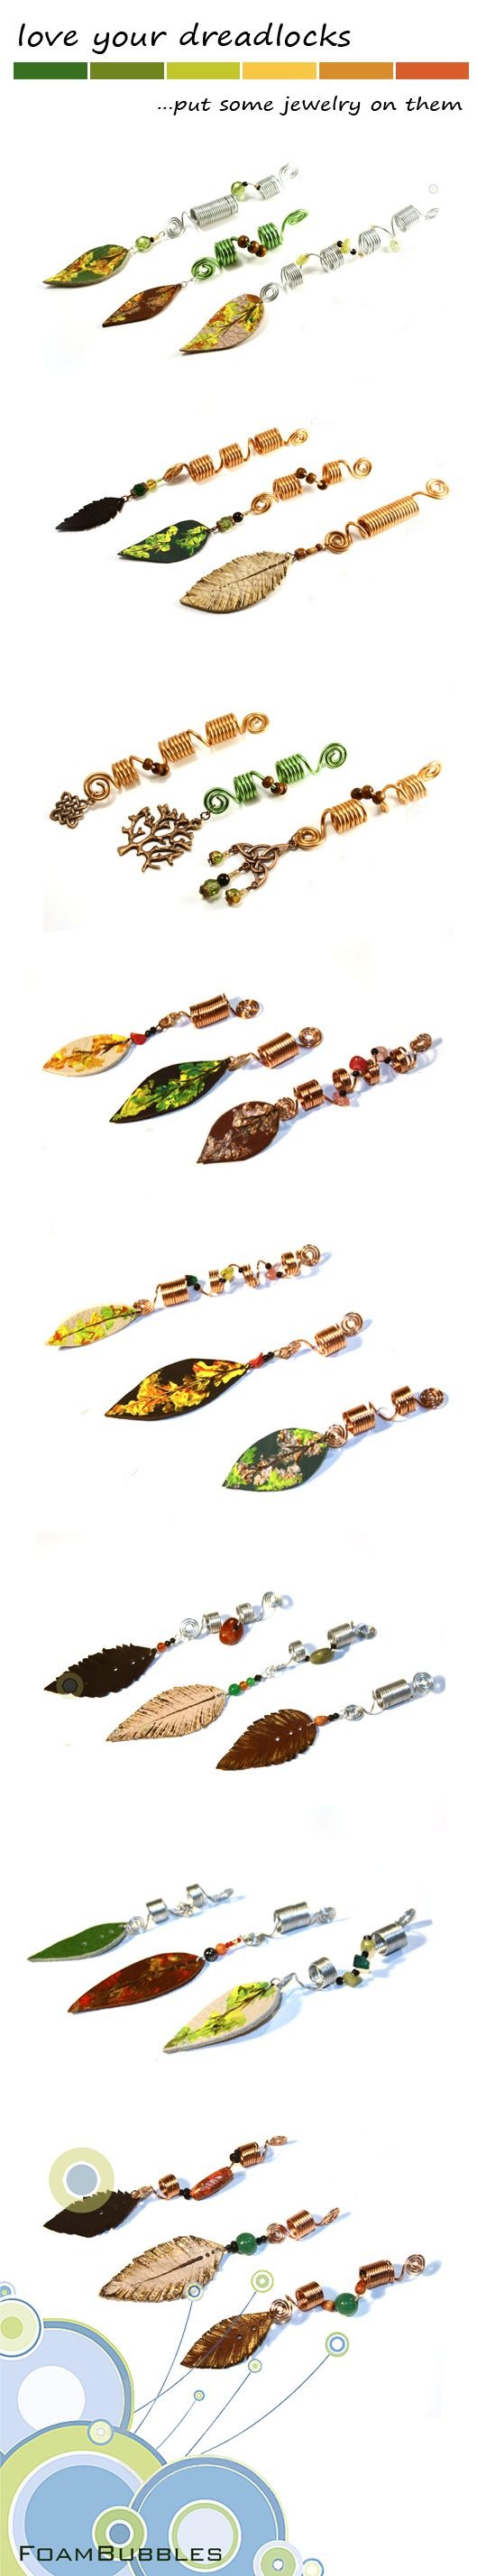 Dreadlocks jewelry, with copper swirl, semiprecious chips, lots of beads…